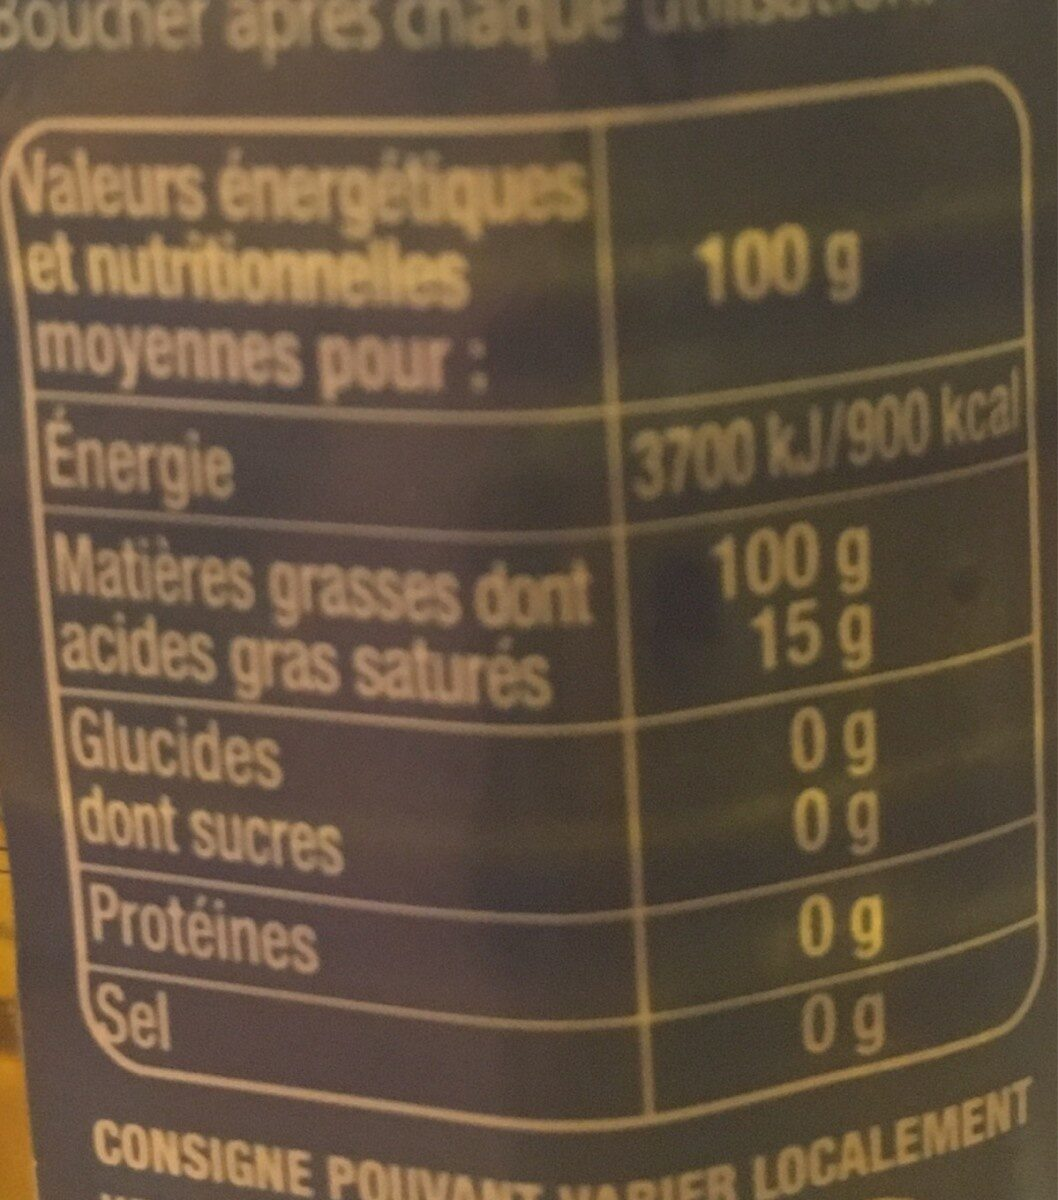 Huile d'olive vierge extra, extraite à froid - Informations nutritionnelles - fr